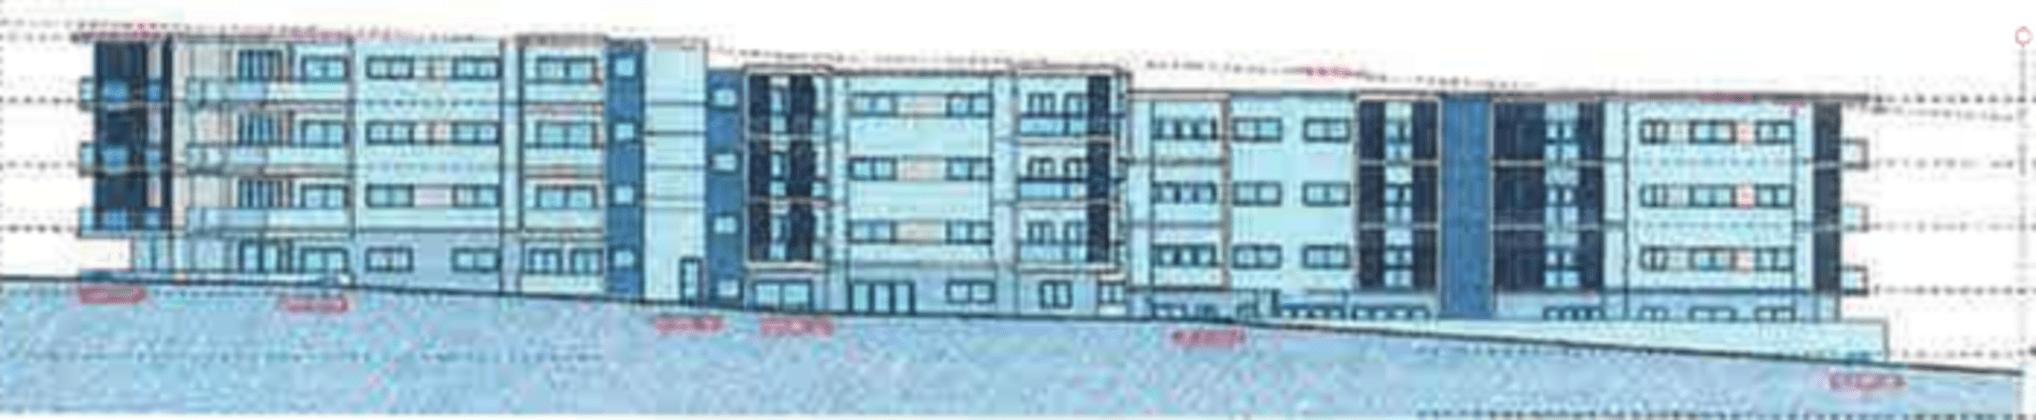 828 Windsor Road, Rouse Hill. Planning Image: UrbanLink